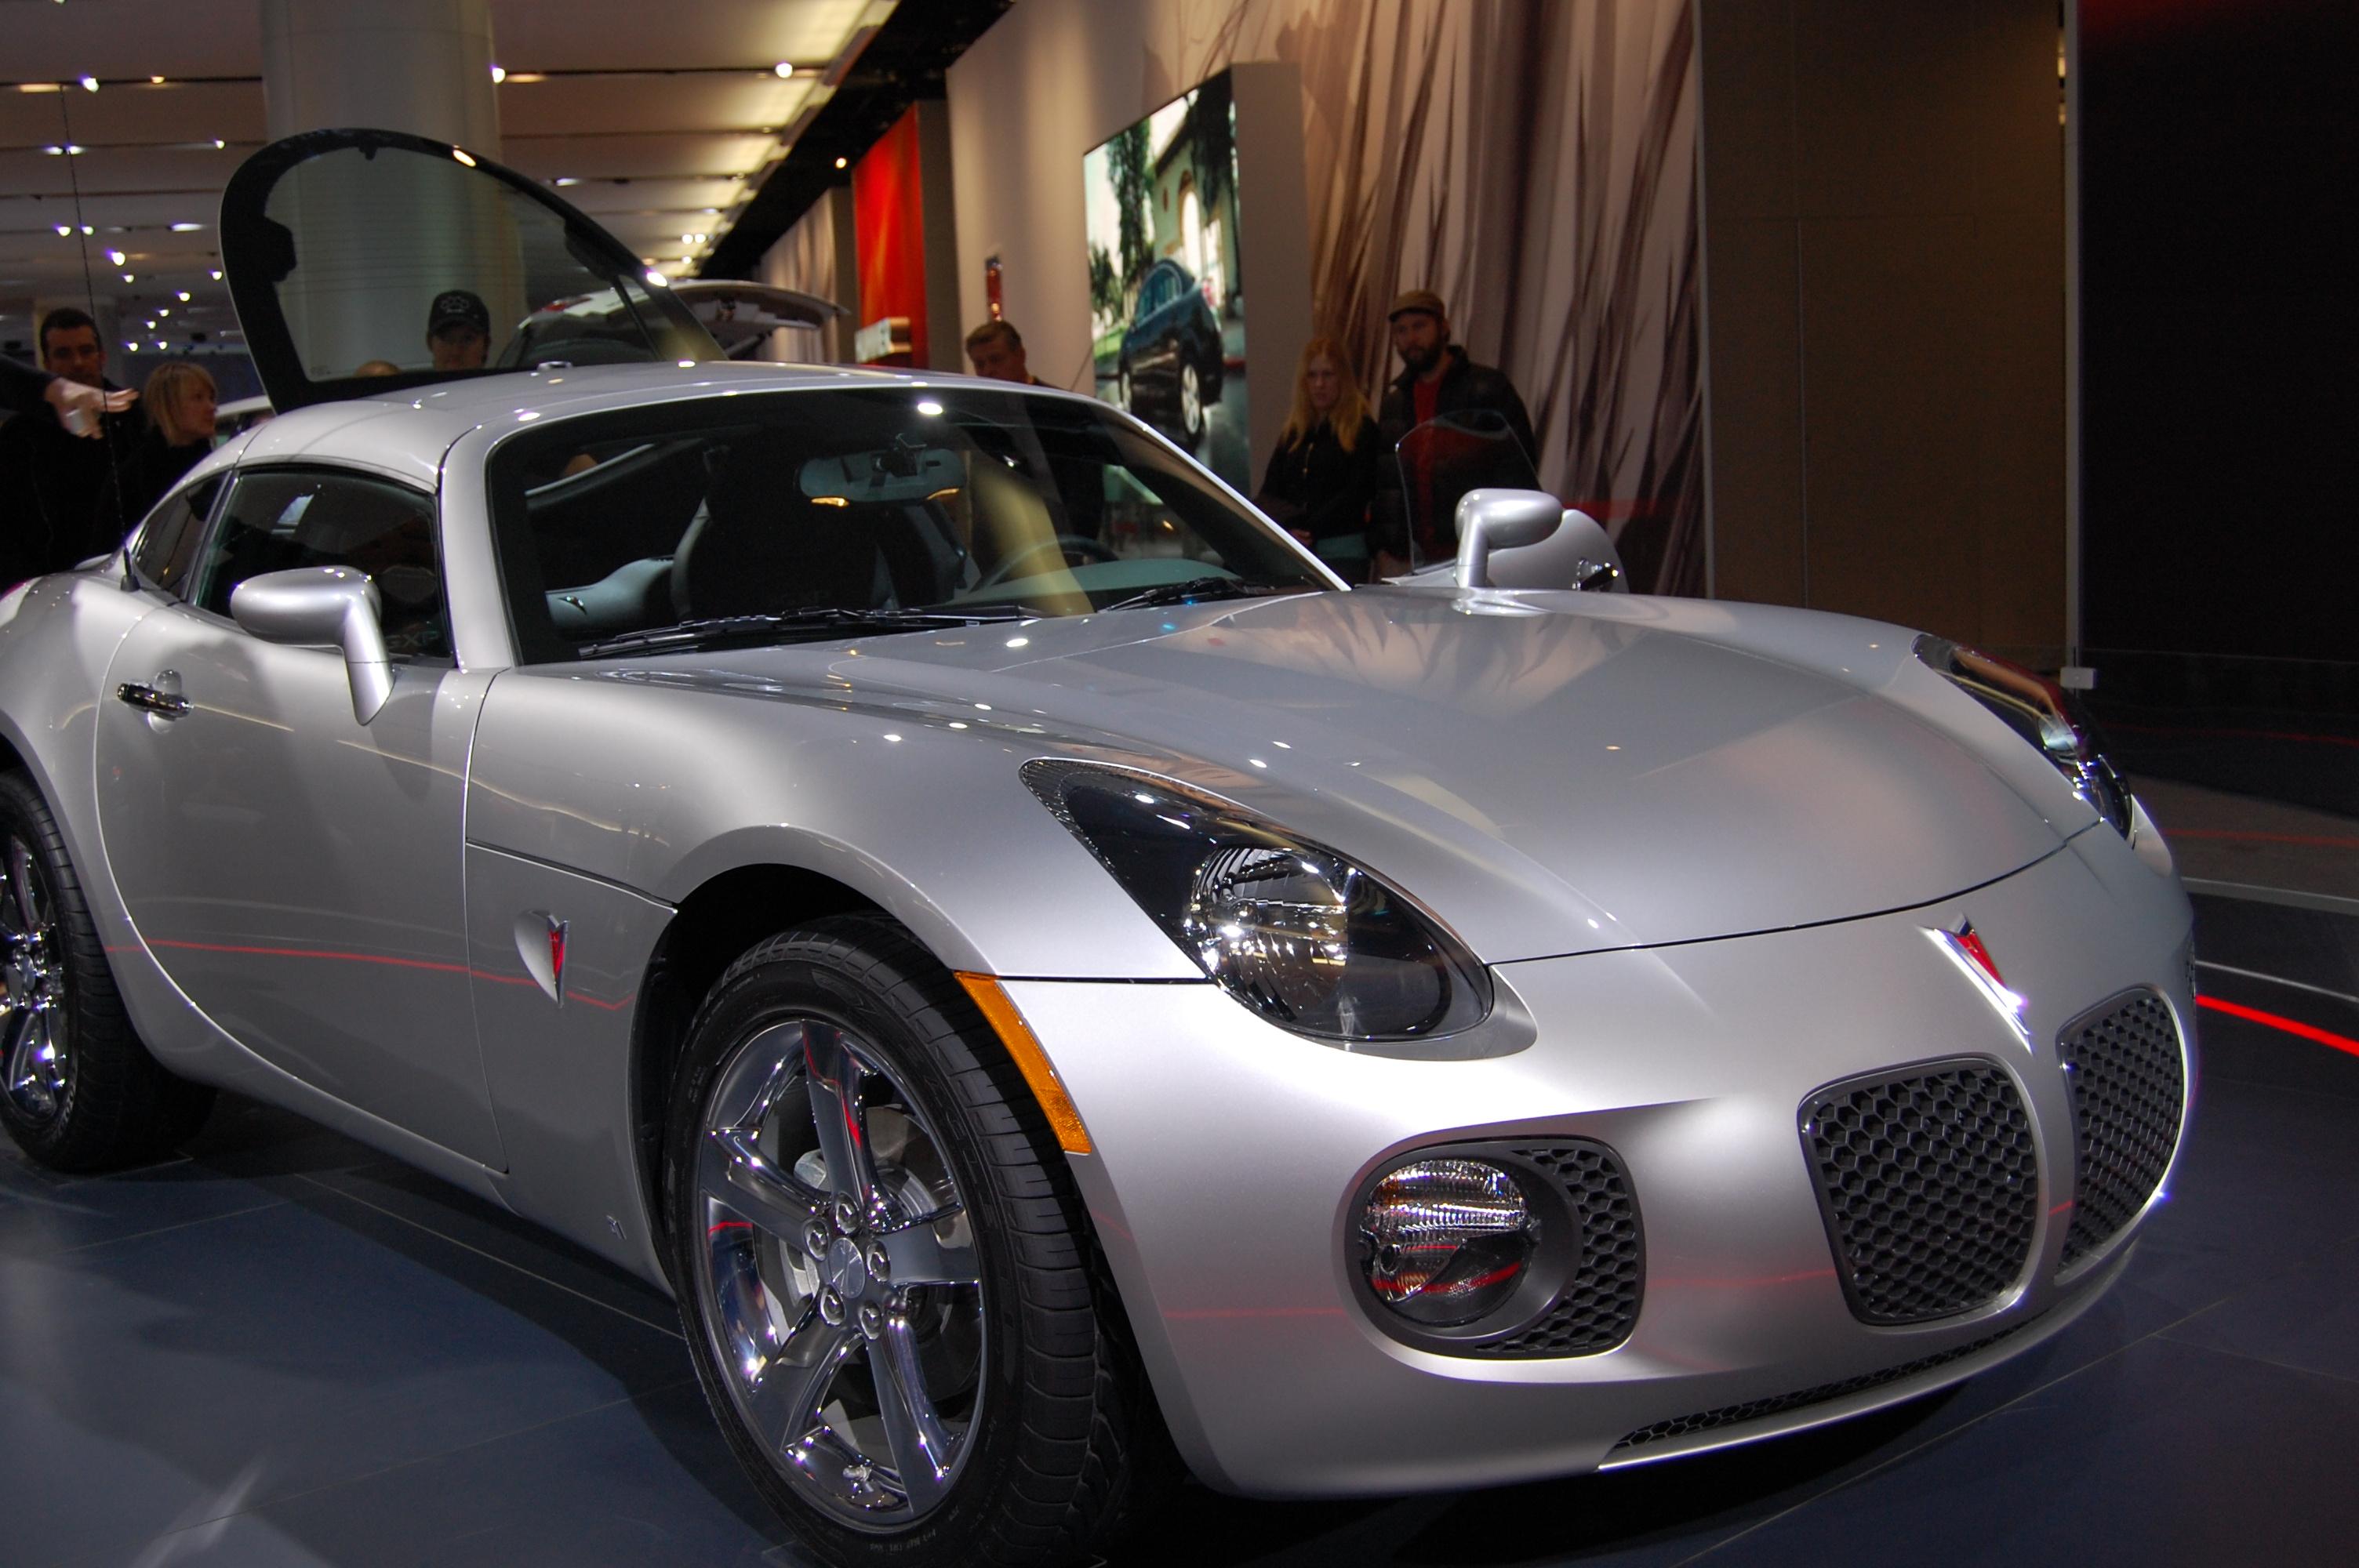 Pontiac Solstice 2005 - 2009 Coupe #5